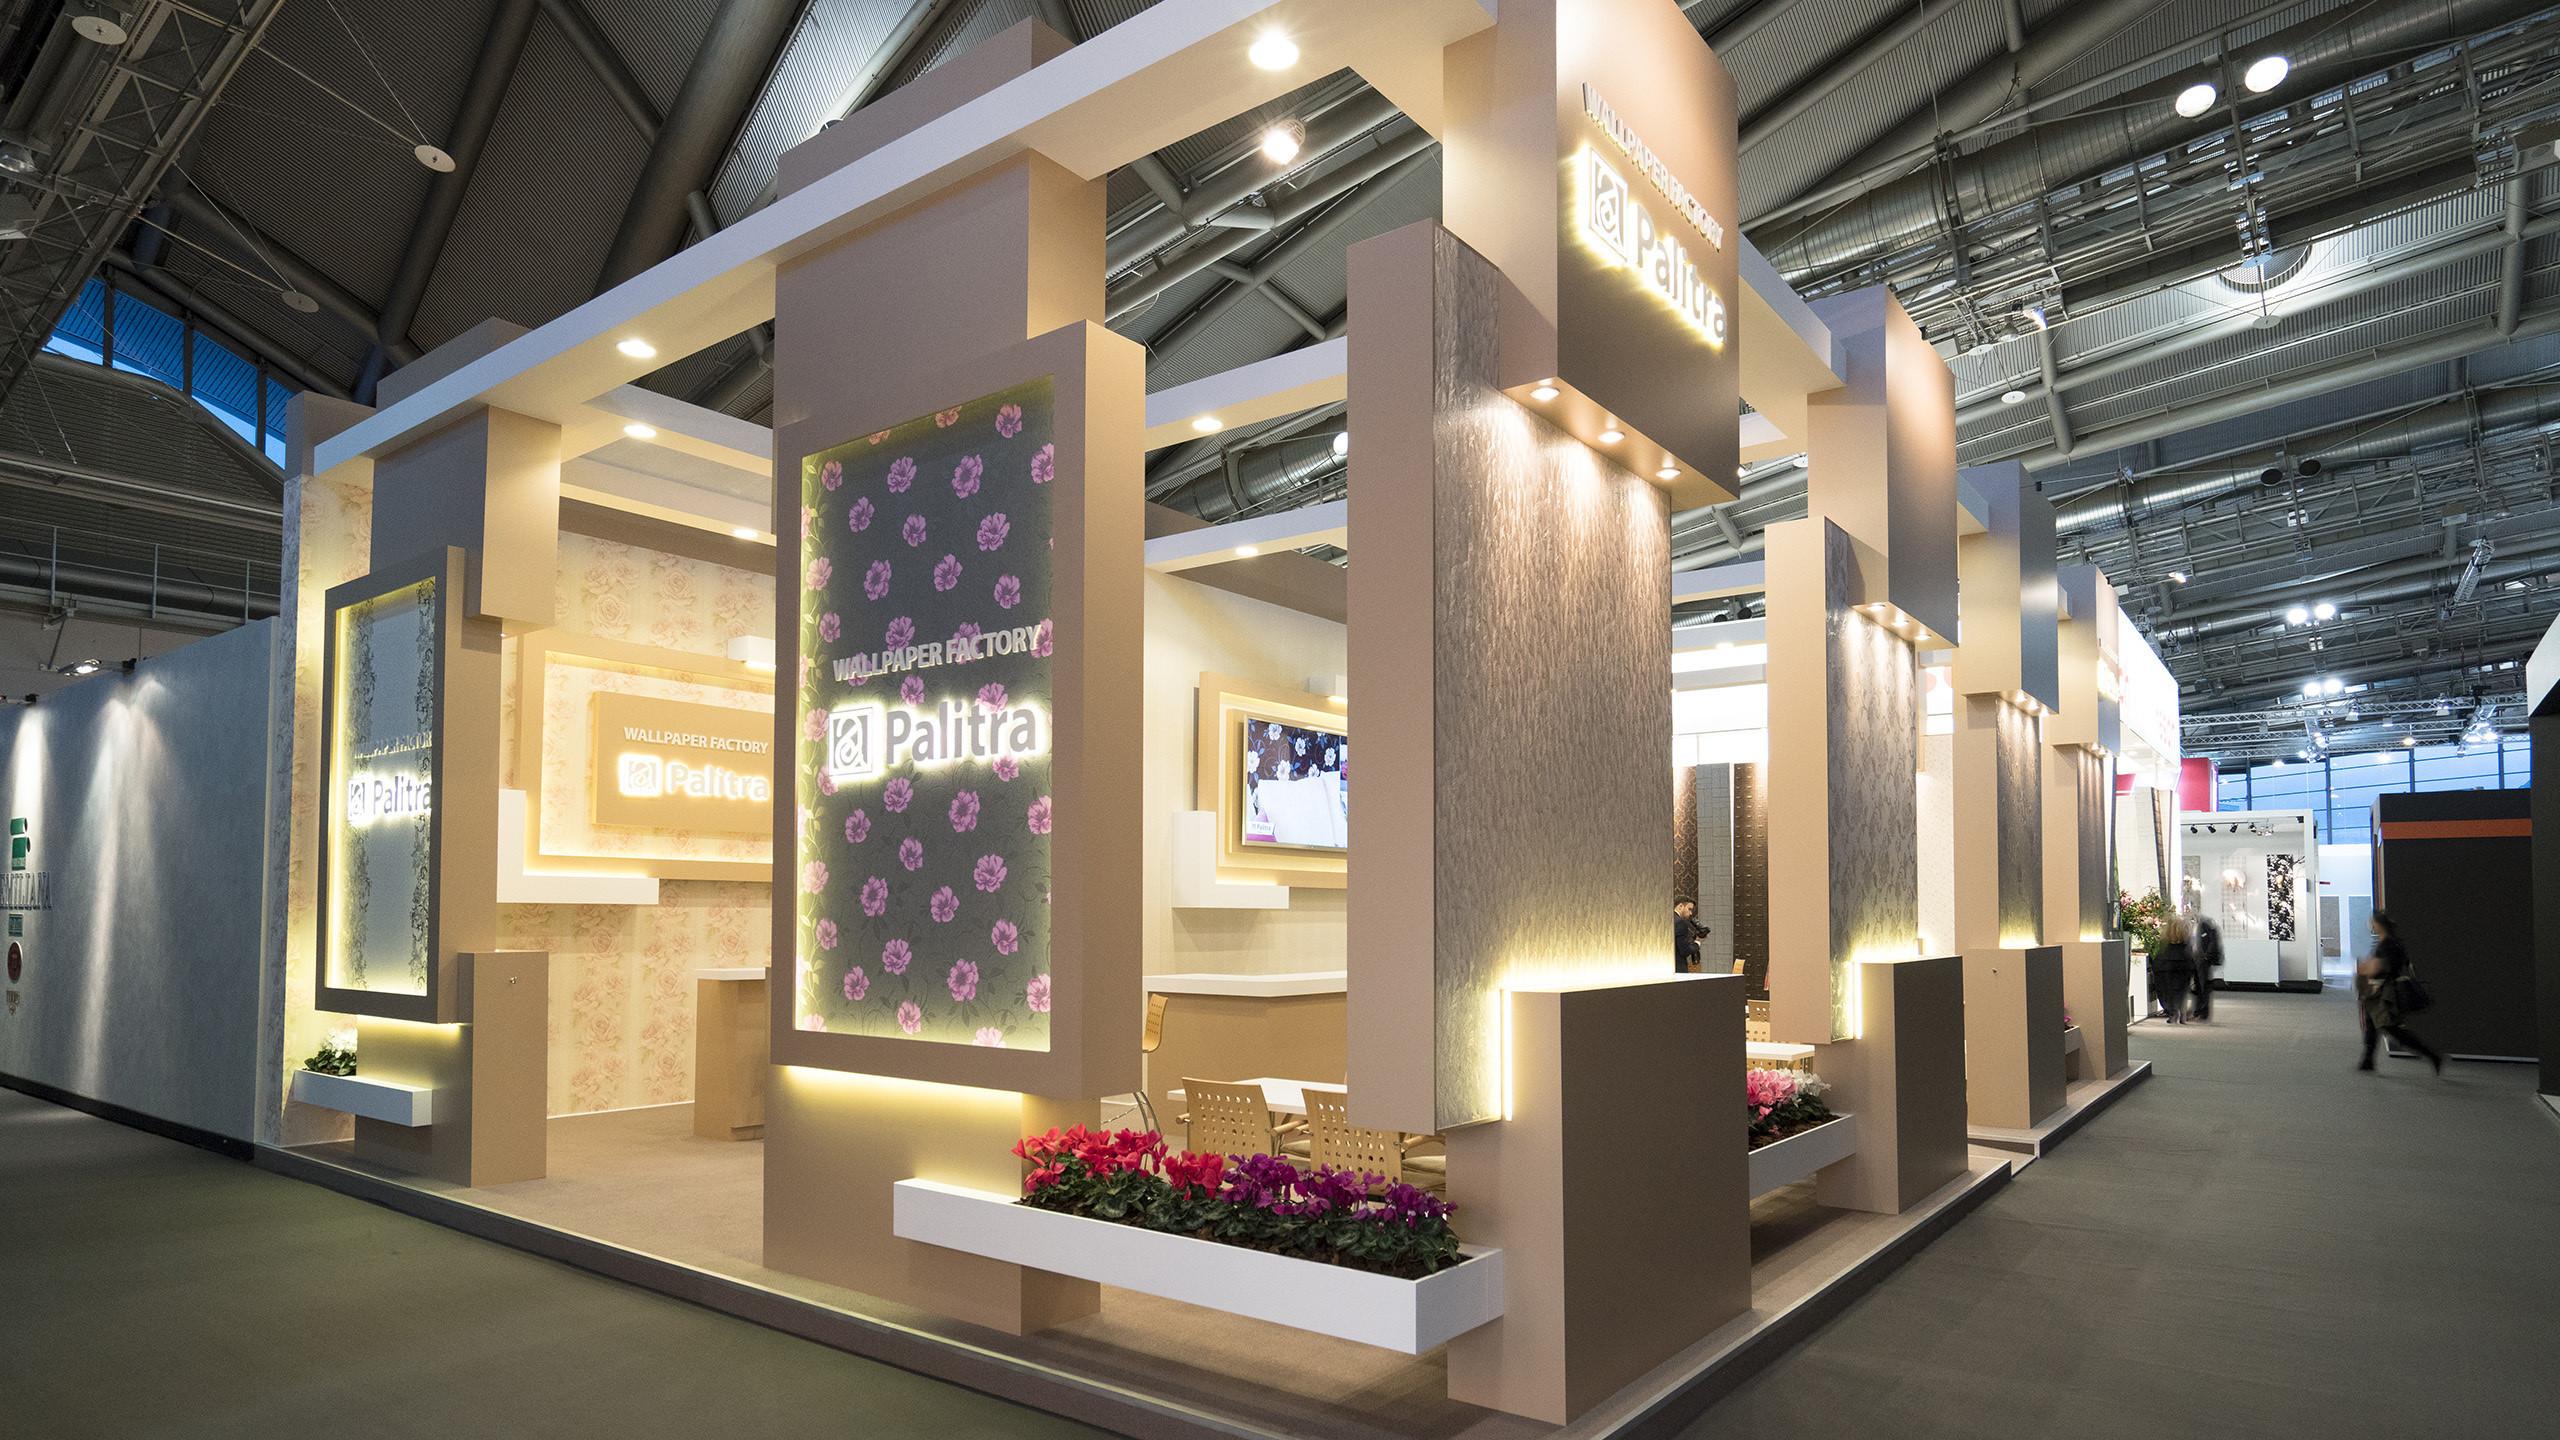 Exhibition Stand Trends 2018 : Palitra heimtextil  frankfurt am main germany